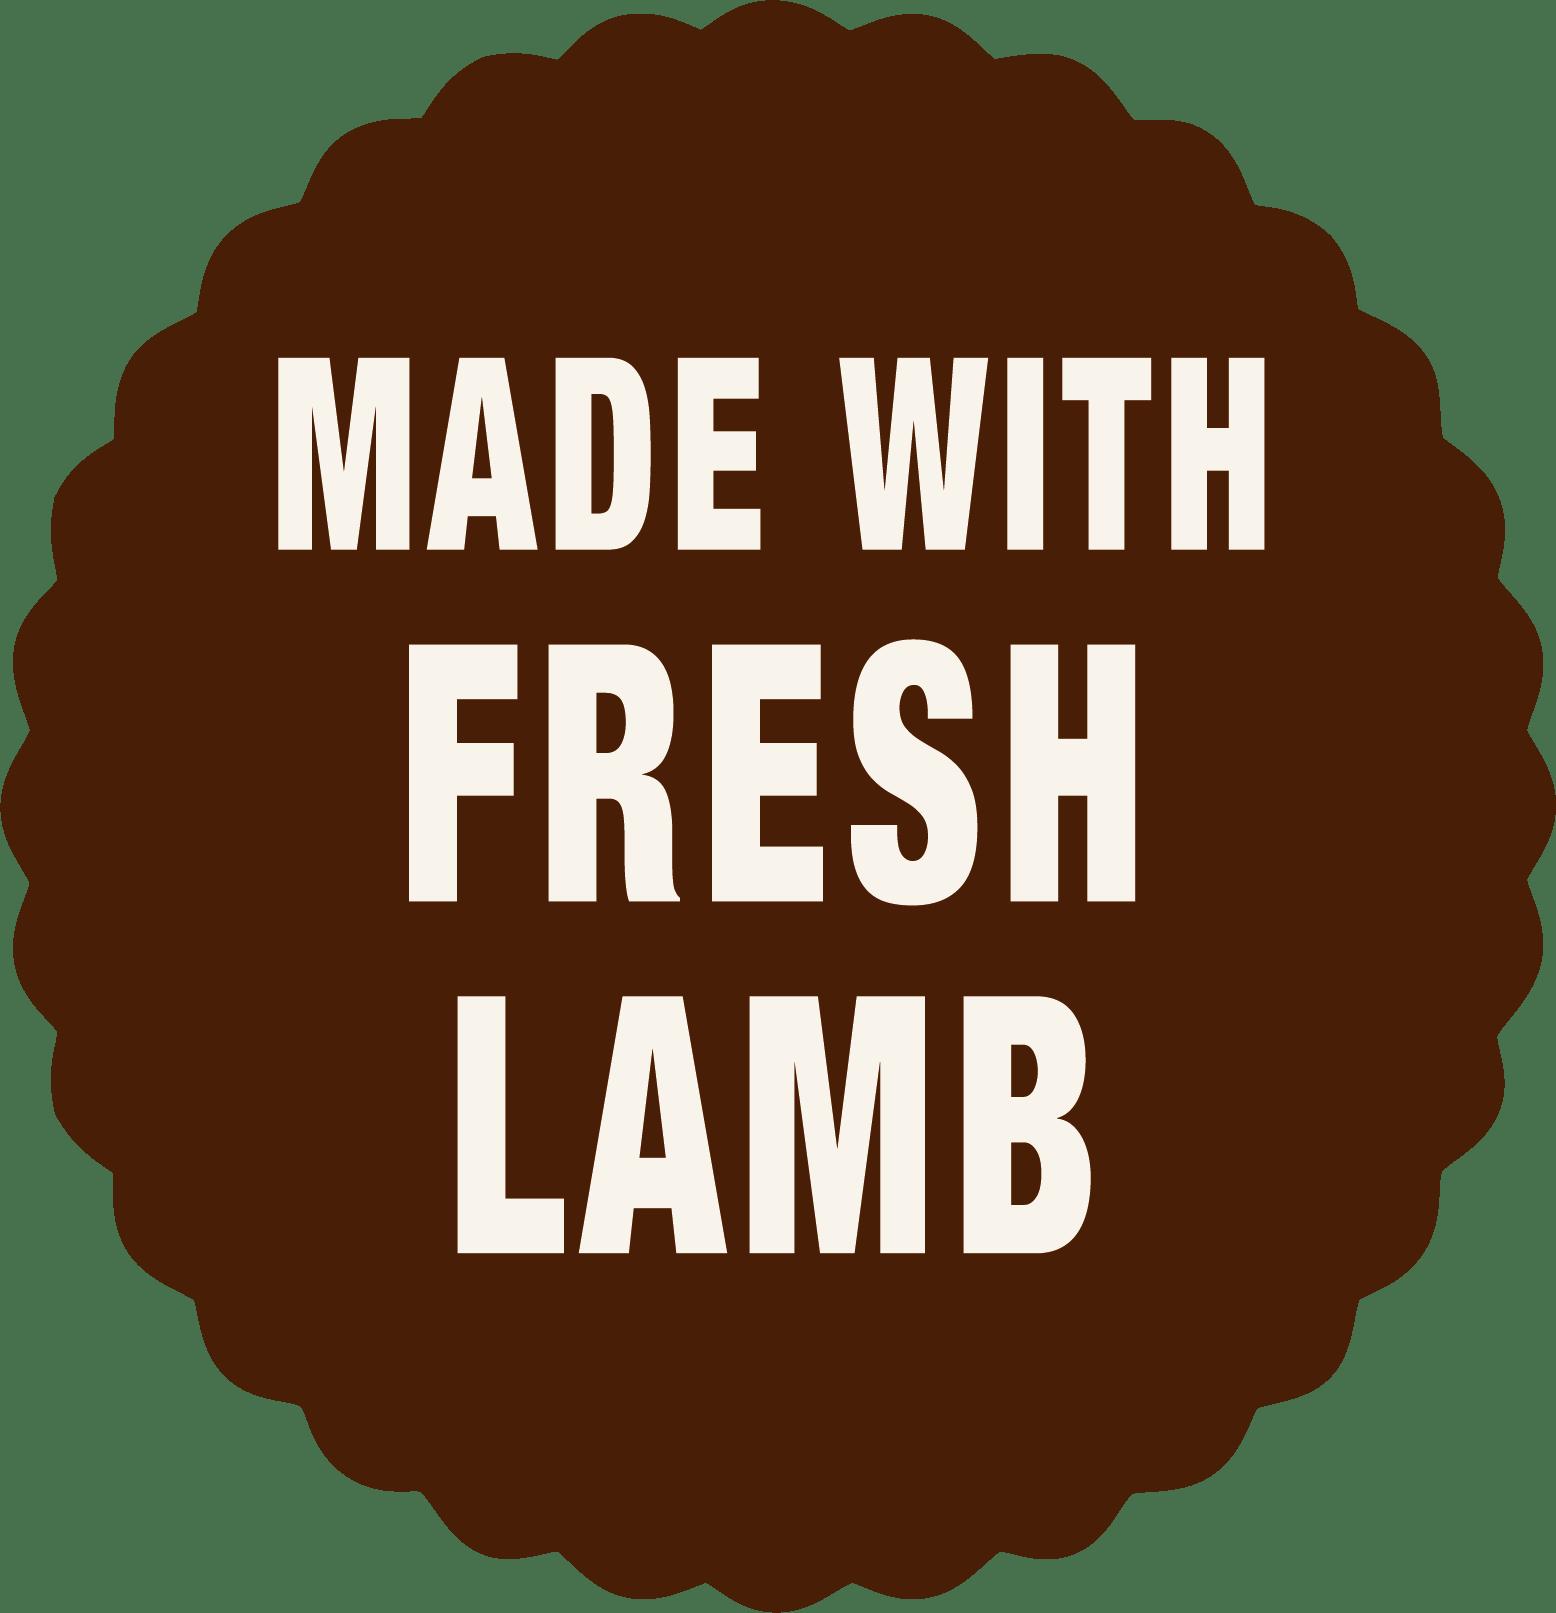 Made with fresh lamb dog food - Laughing Dog Food